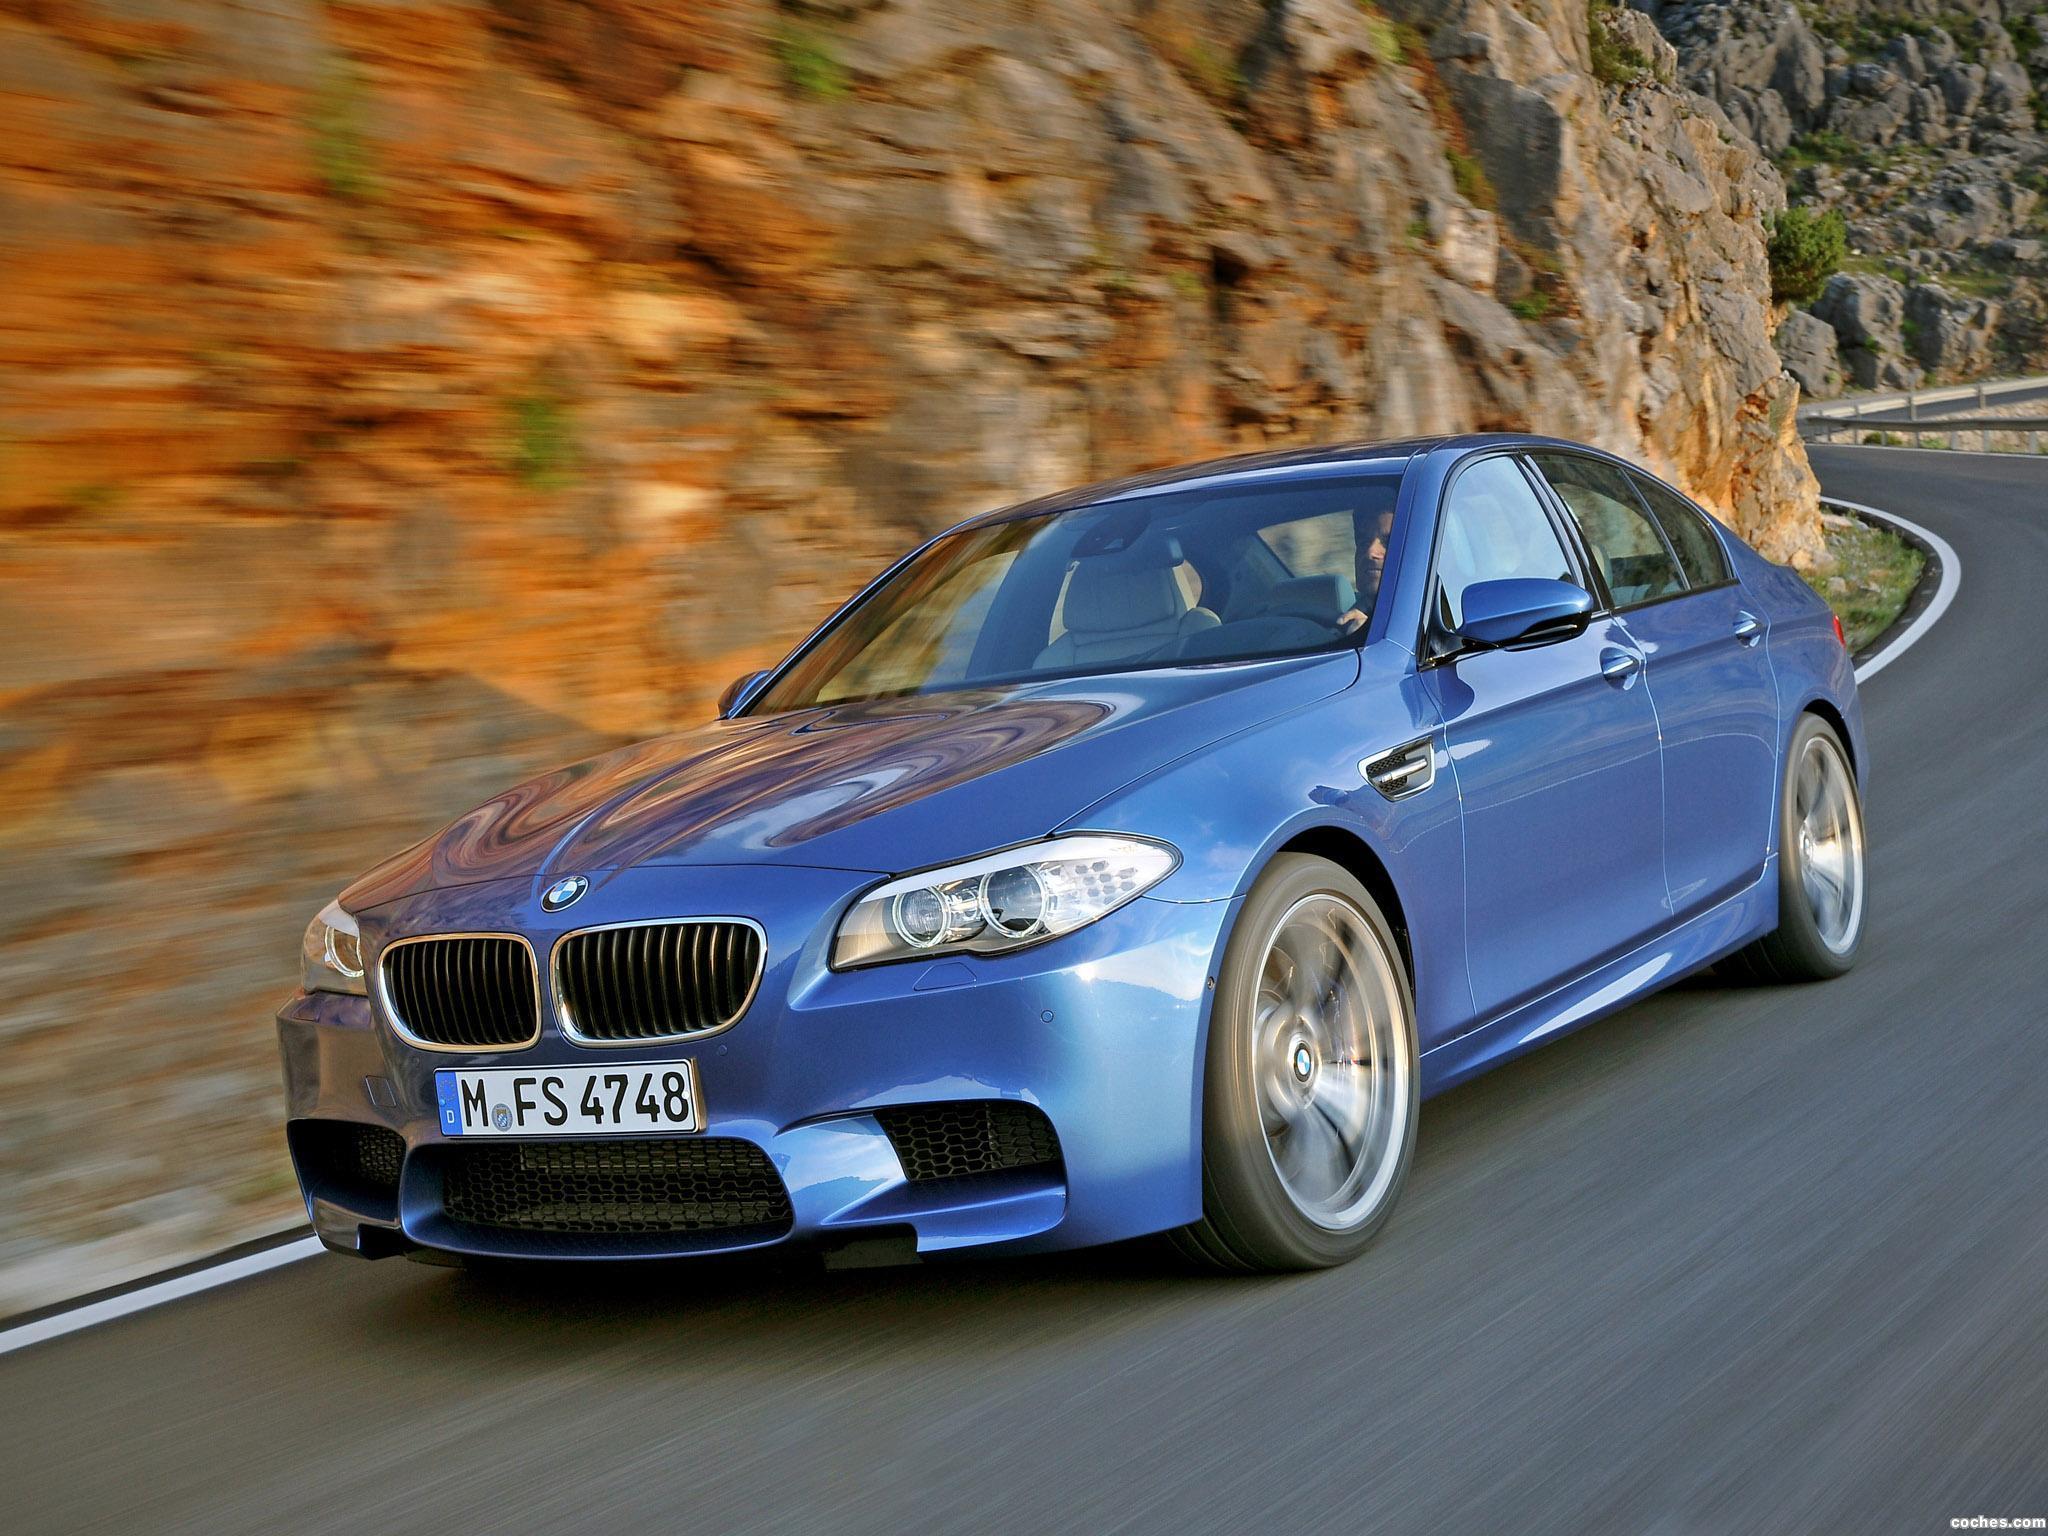 Foto 2 de BMW M5 Sedan F10 2011